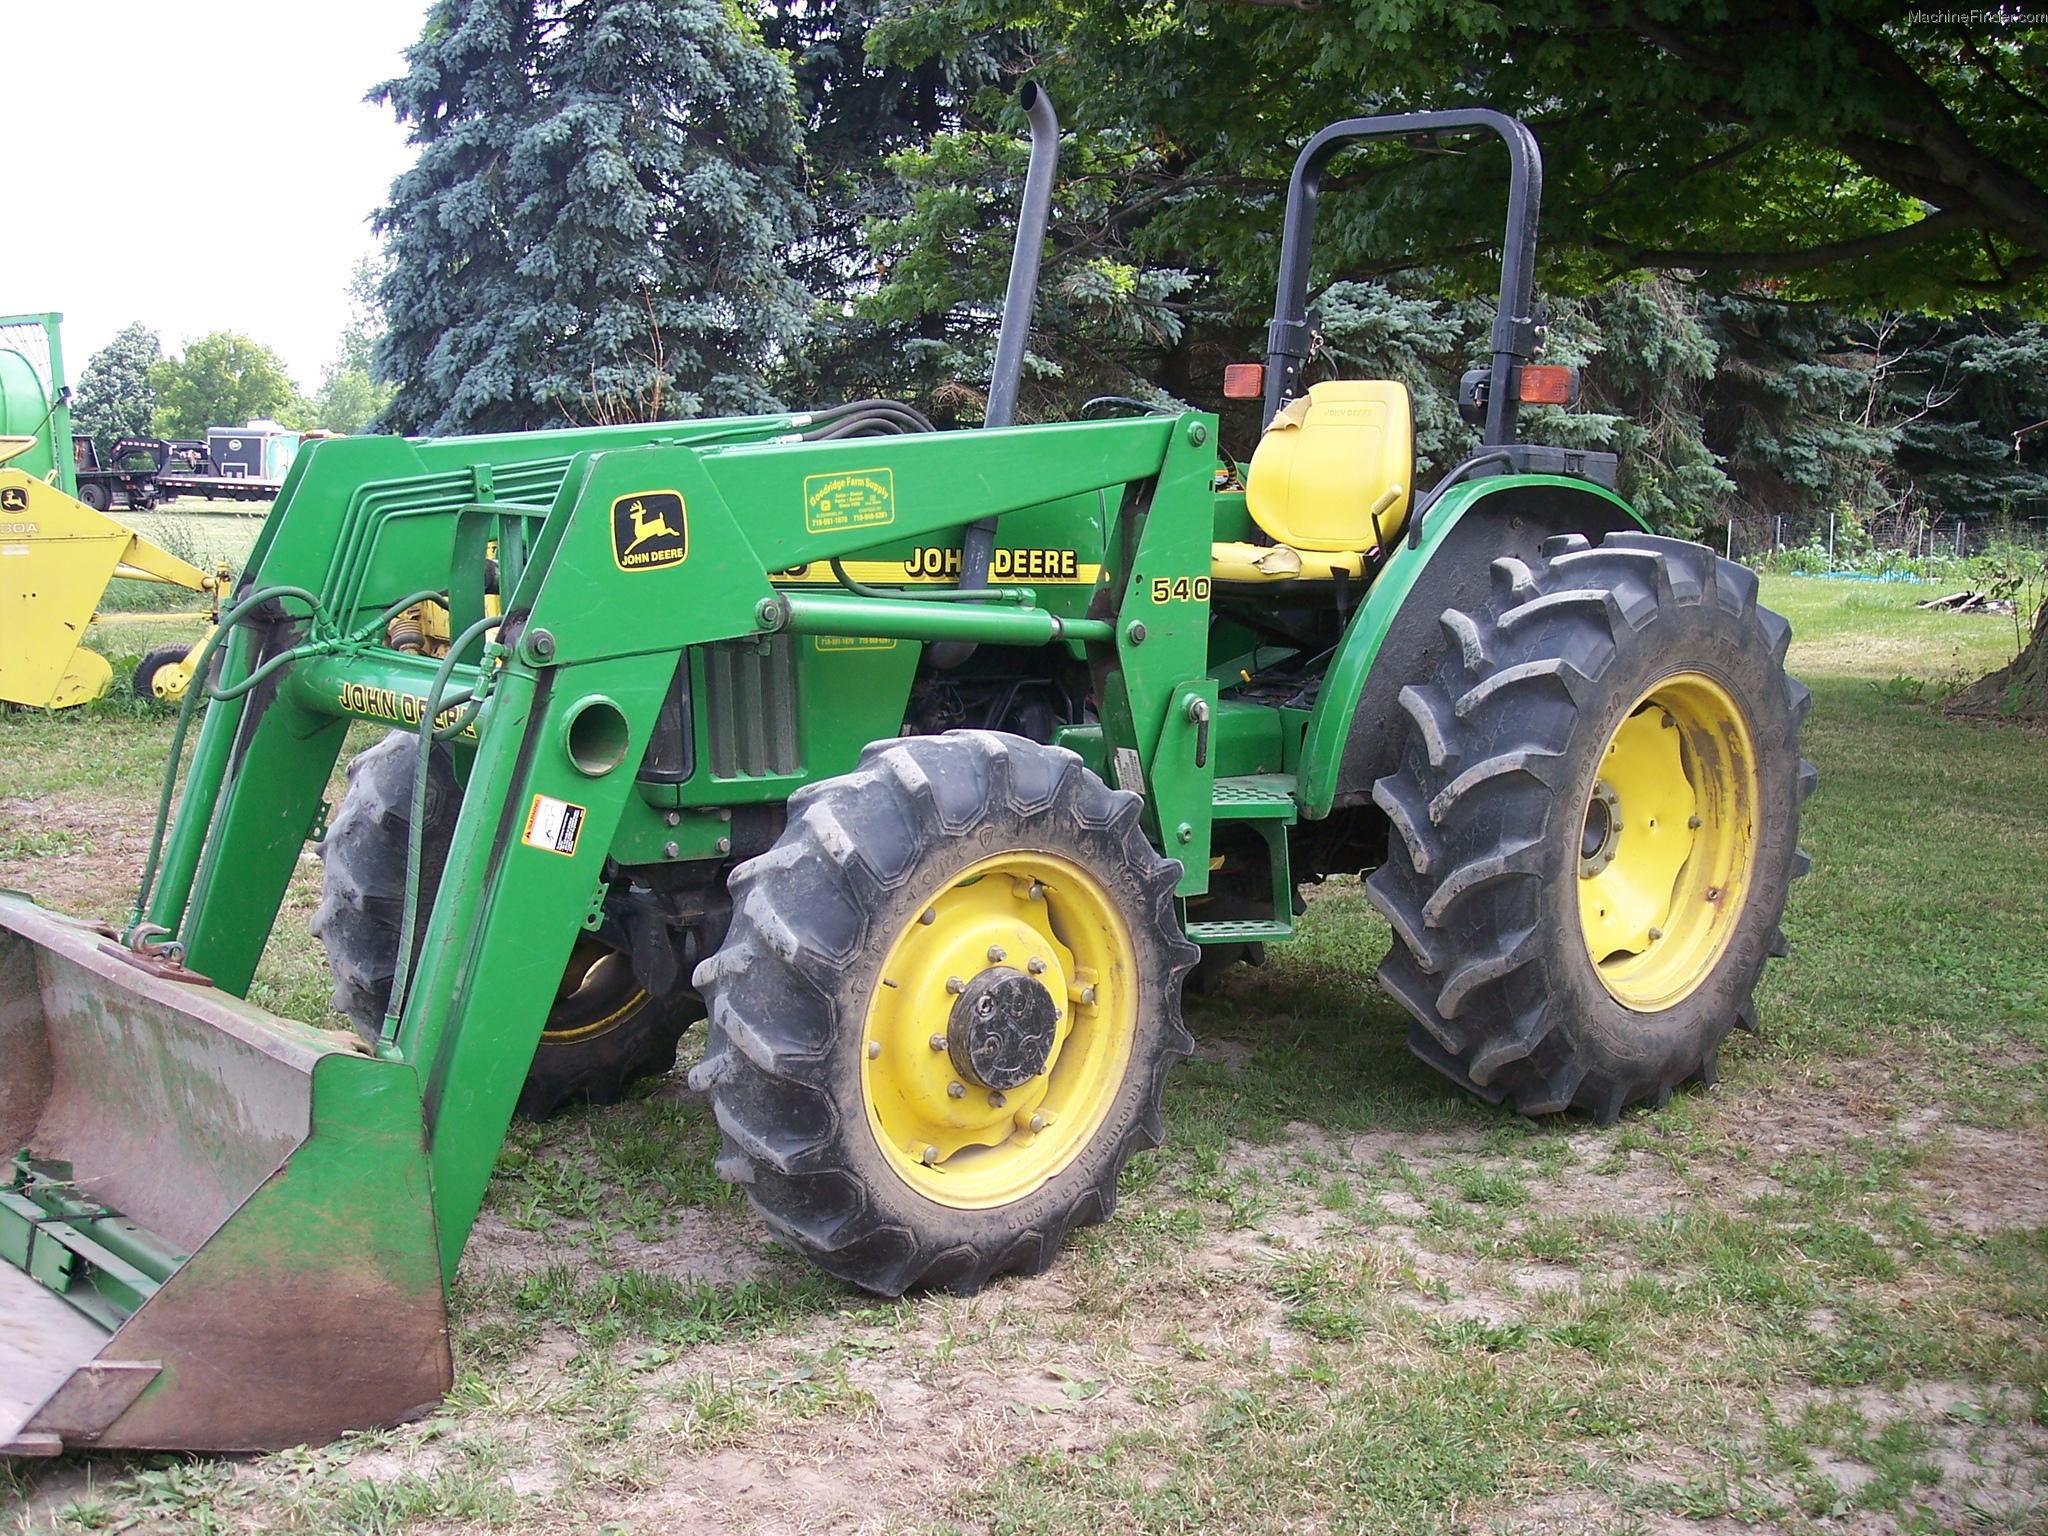 1998 John Deere 5310 Tractors - Utility (40-100hp) - John ...